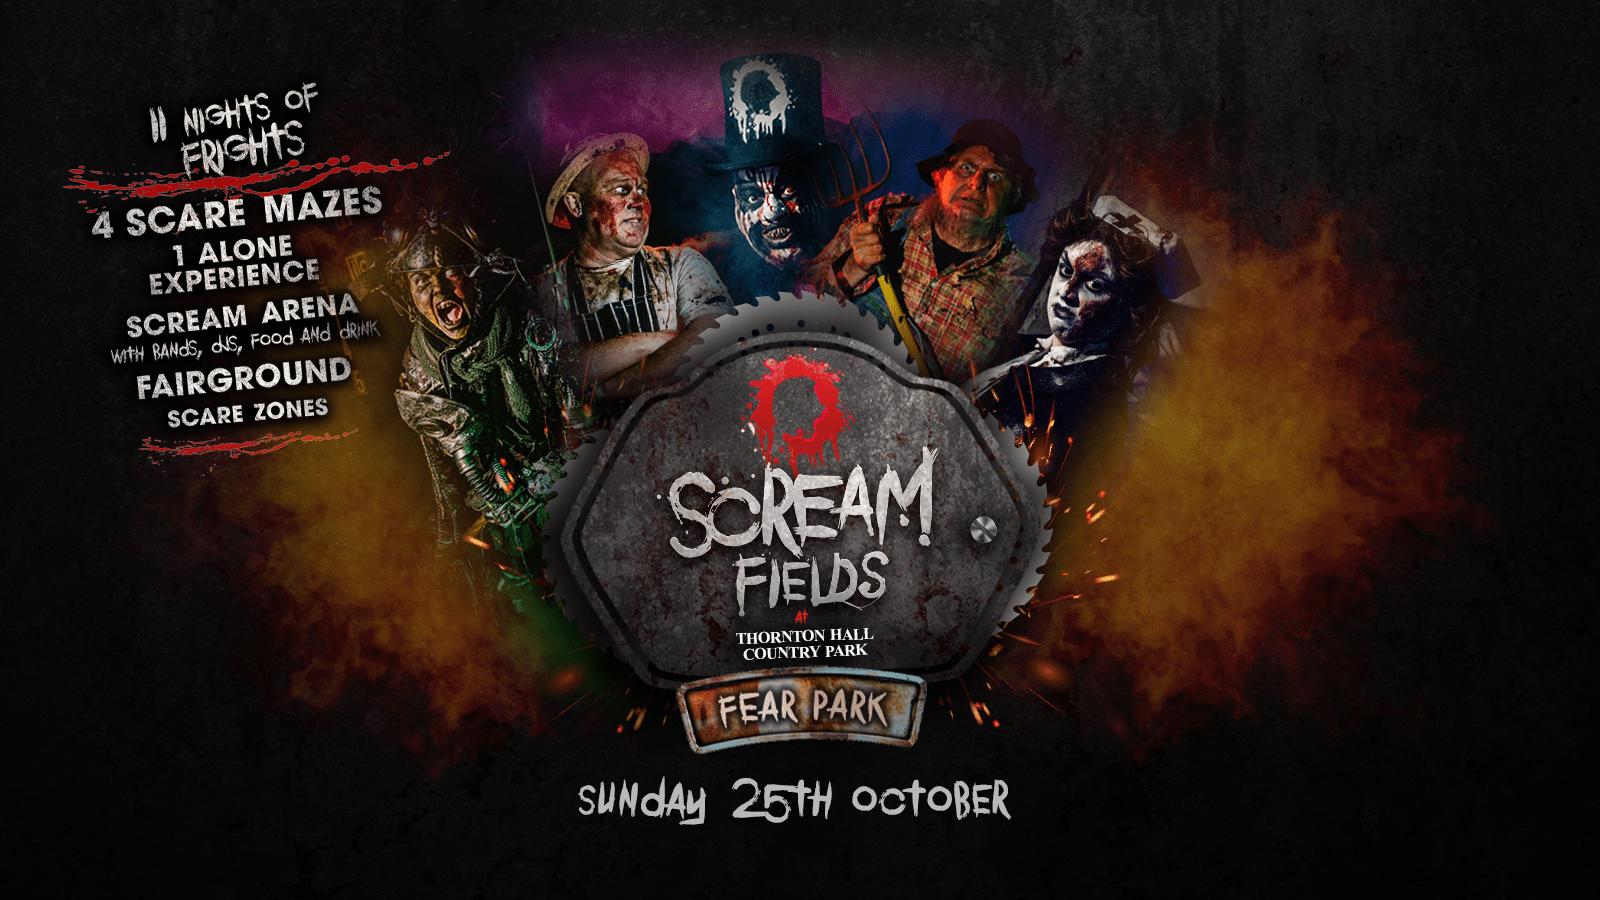 6.45PM – Screamfields: Sunday 25th October 2020